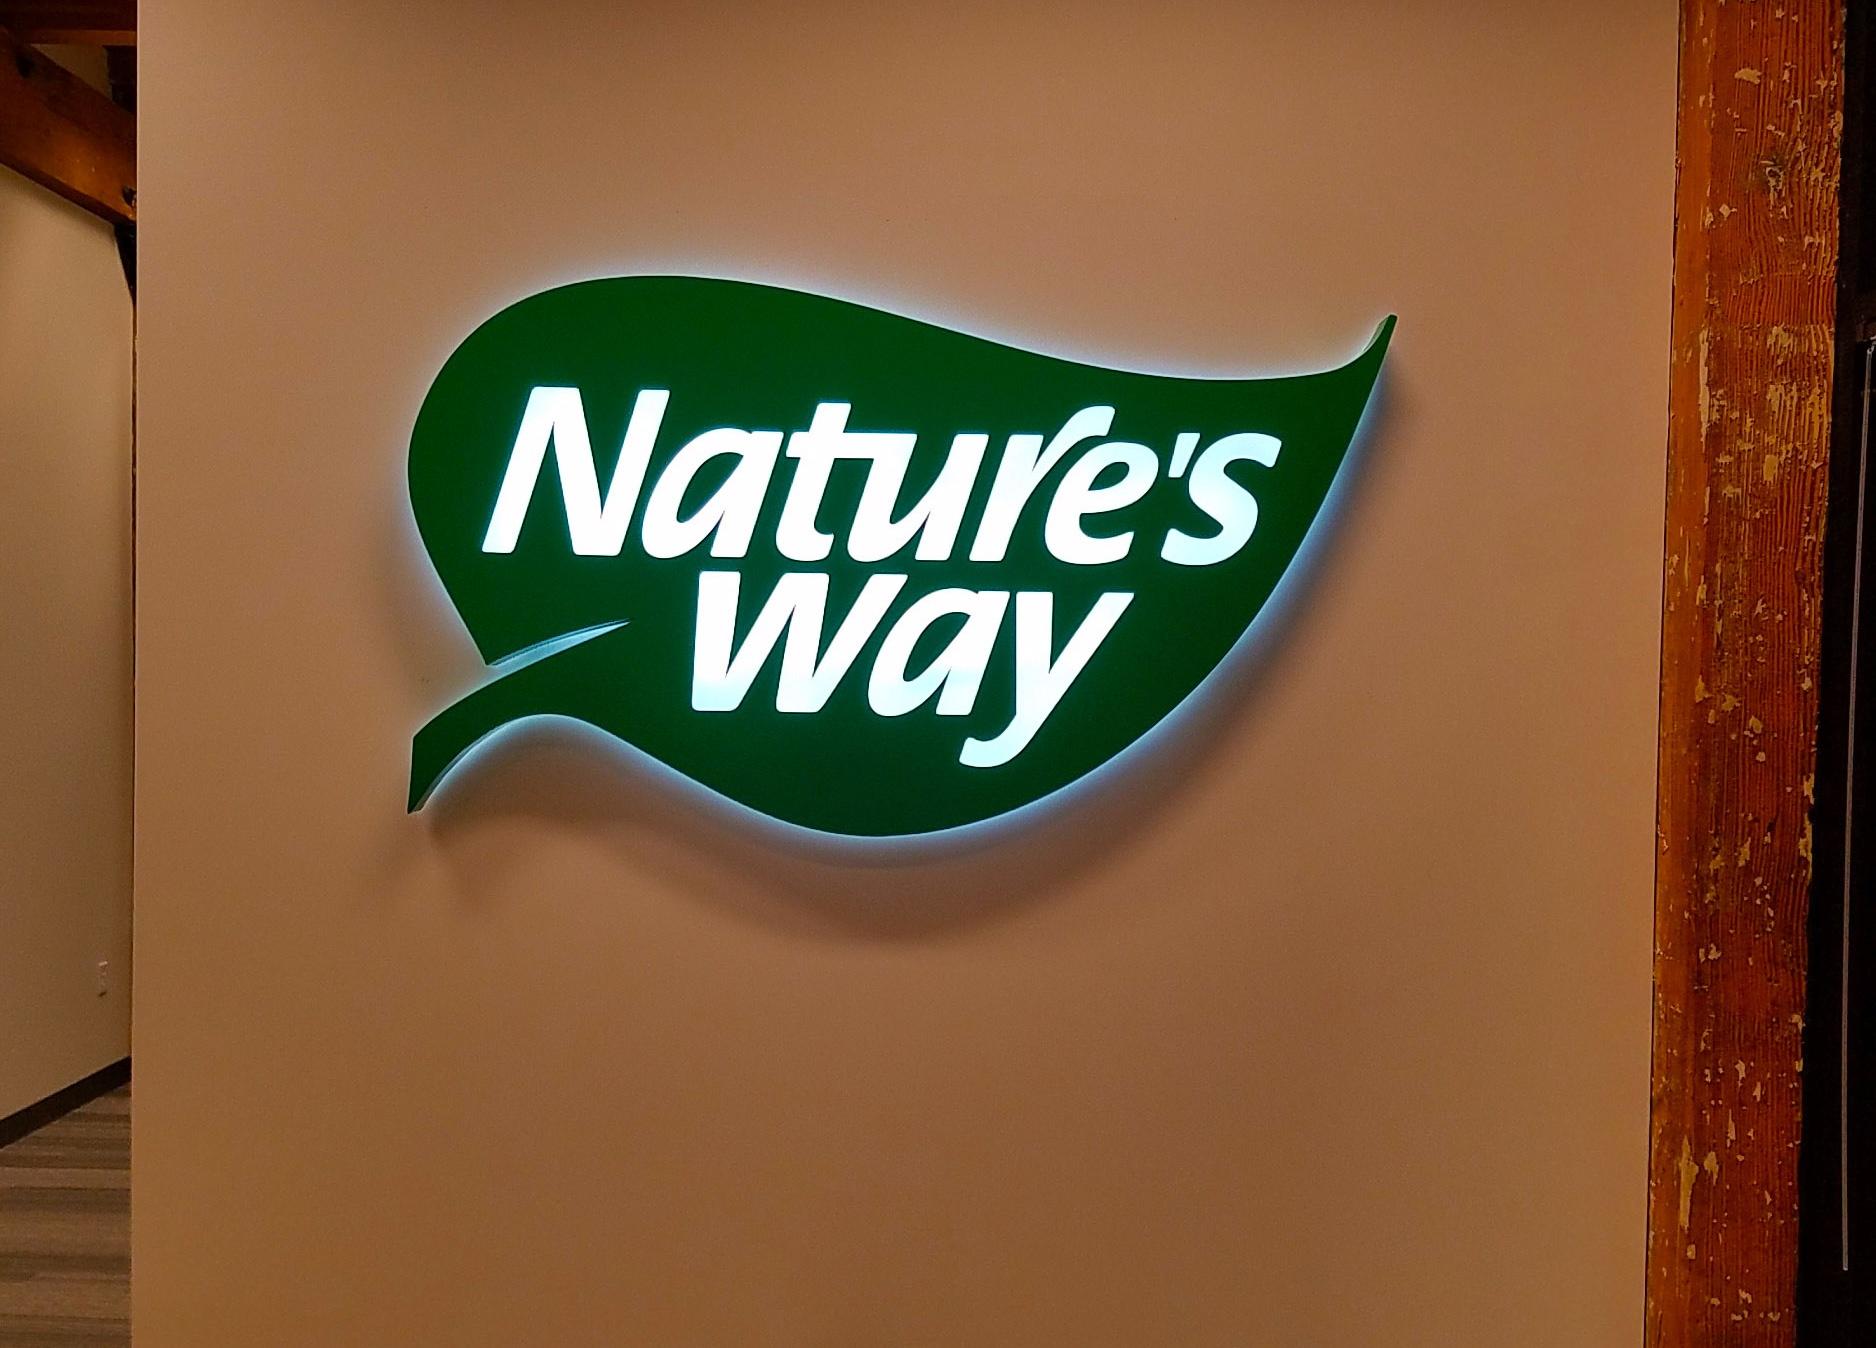 Natures Way LED Halo Sign.jpg